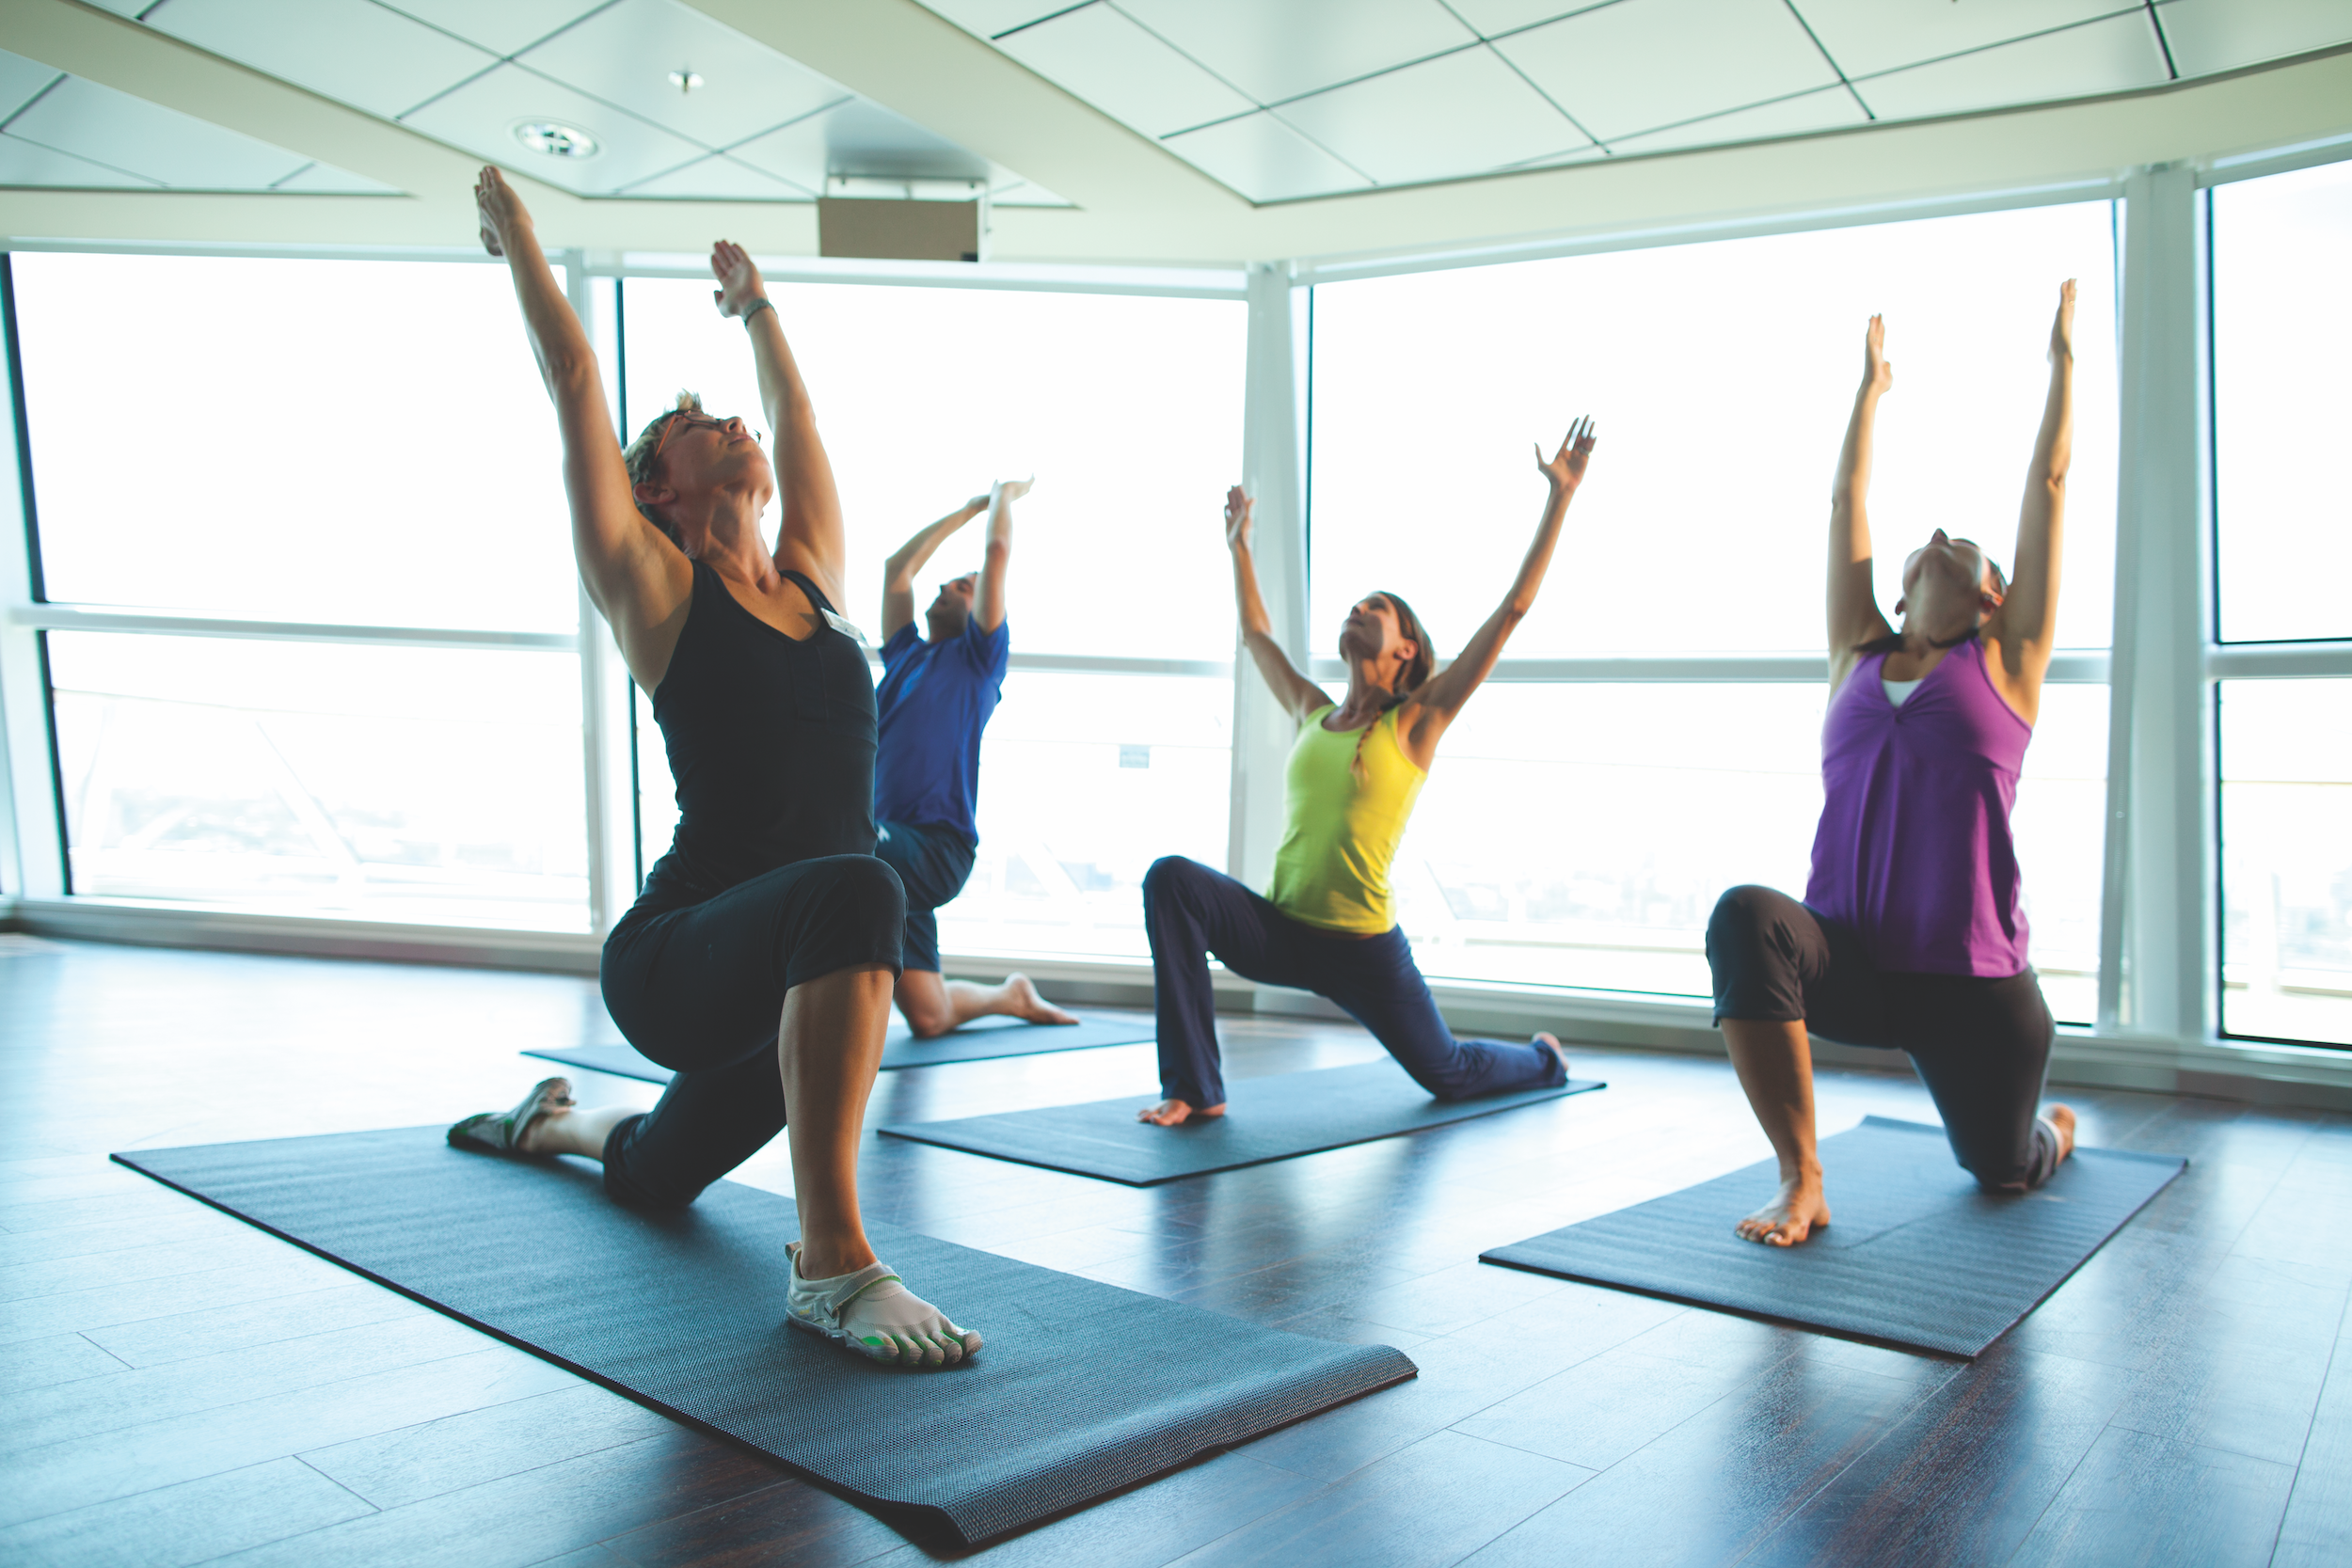 Group of 4 people doing yoga